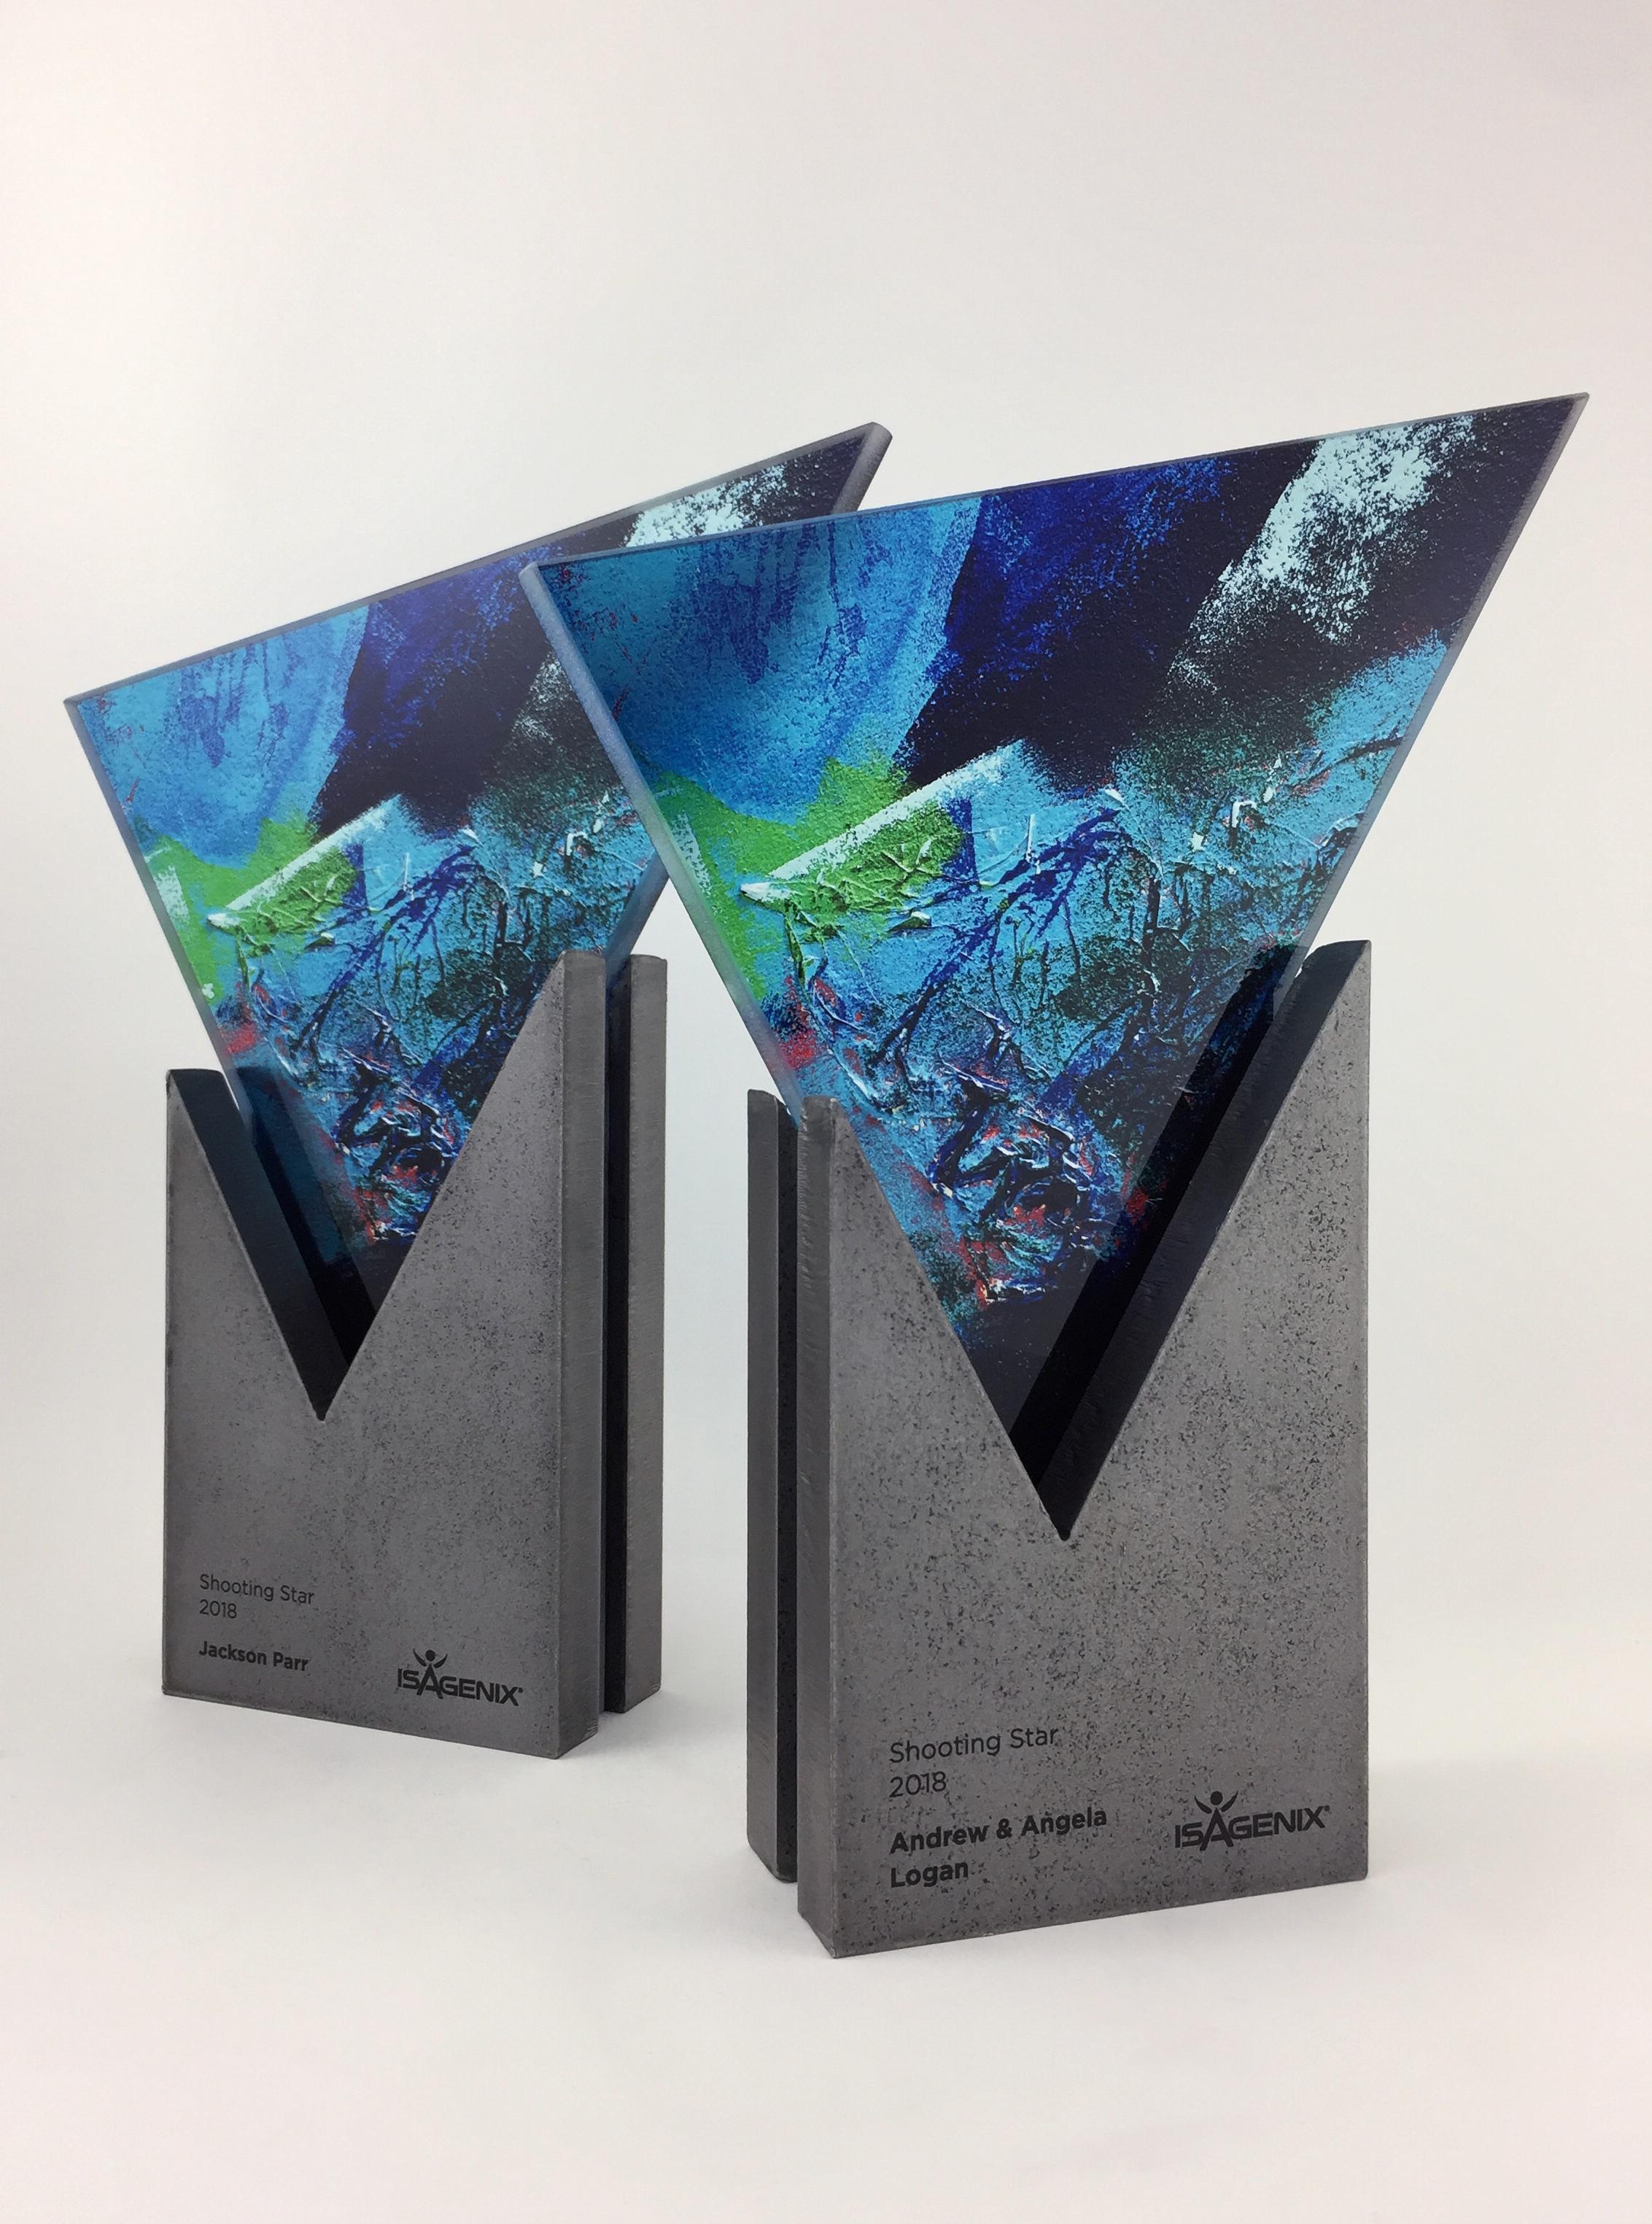 isagenix-shooting-star-metal-glass-art-trophy-awards-sculpture-02.jpg